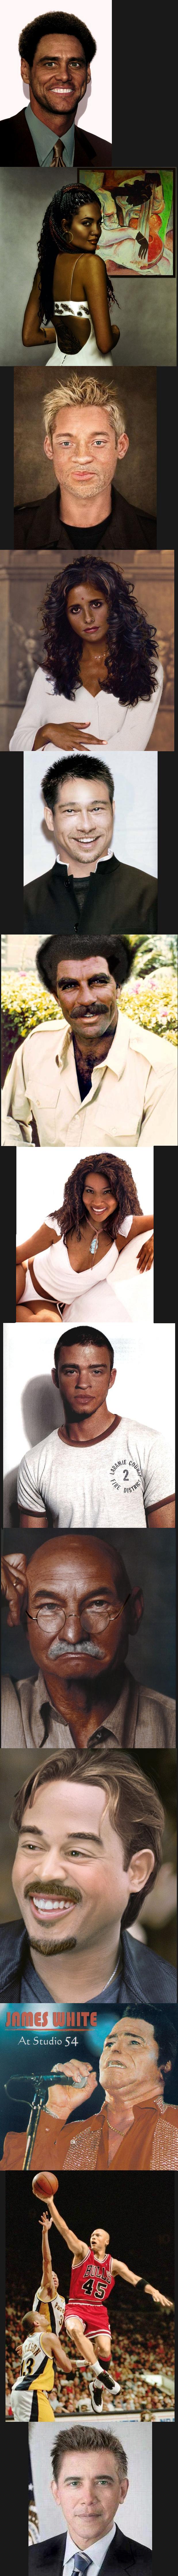 If celebrities were different a race. 1. Black Jim Carrey 2. Indian Angelina Jolie 3. White Will Smith 4. Indian Sarah Michelle Gellar 5. Asian Brad Pitt 6. Bla